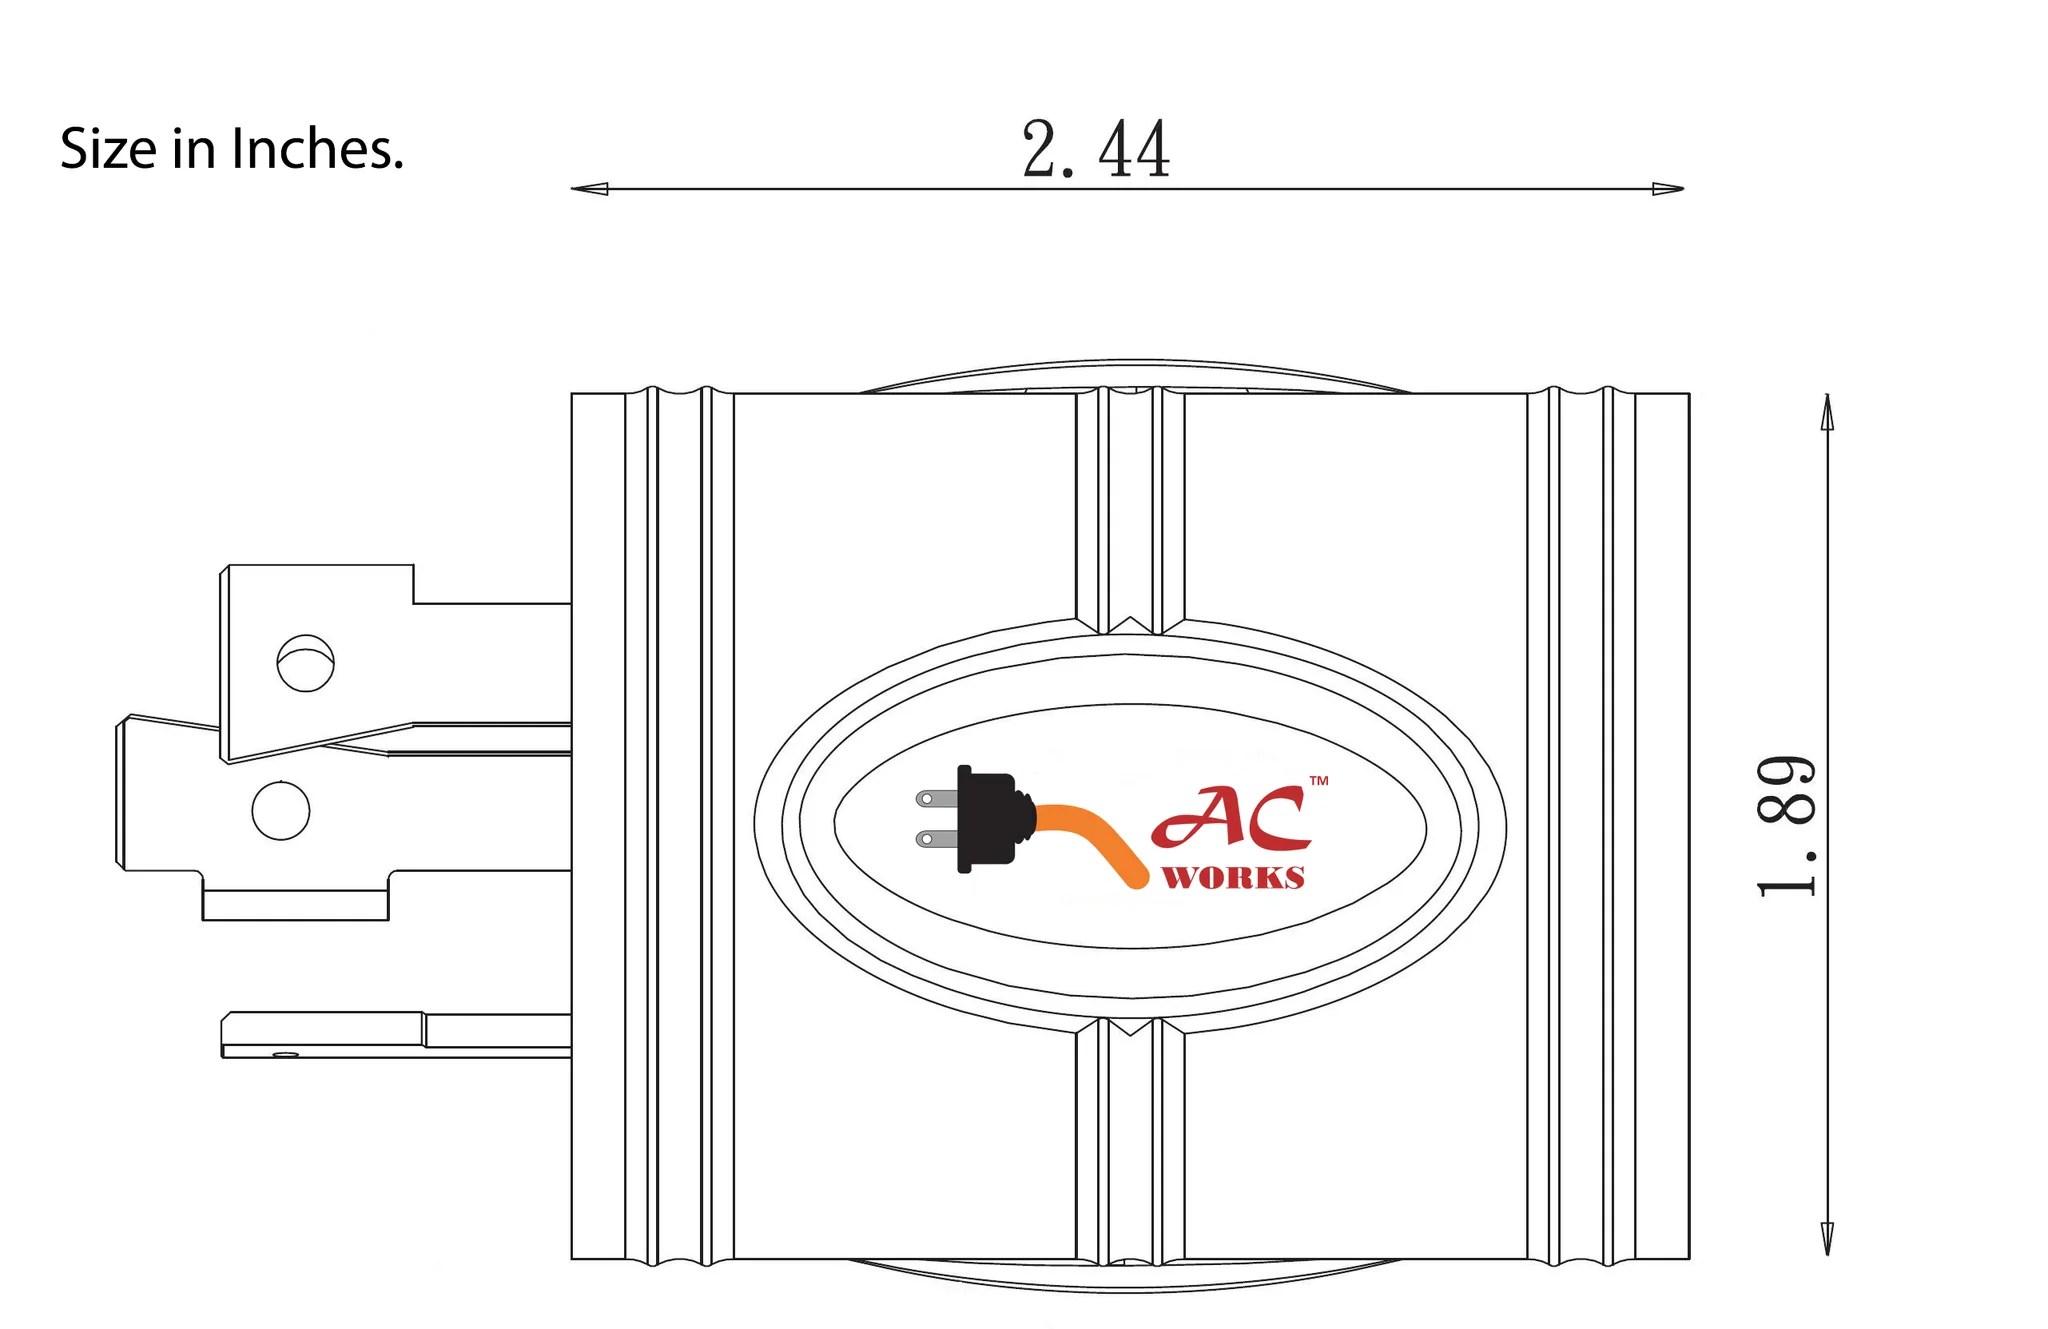 medium resolution of  ac connectors ac works adl530l520 3 prong locking plug nema l5